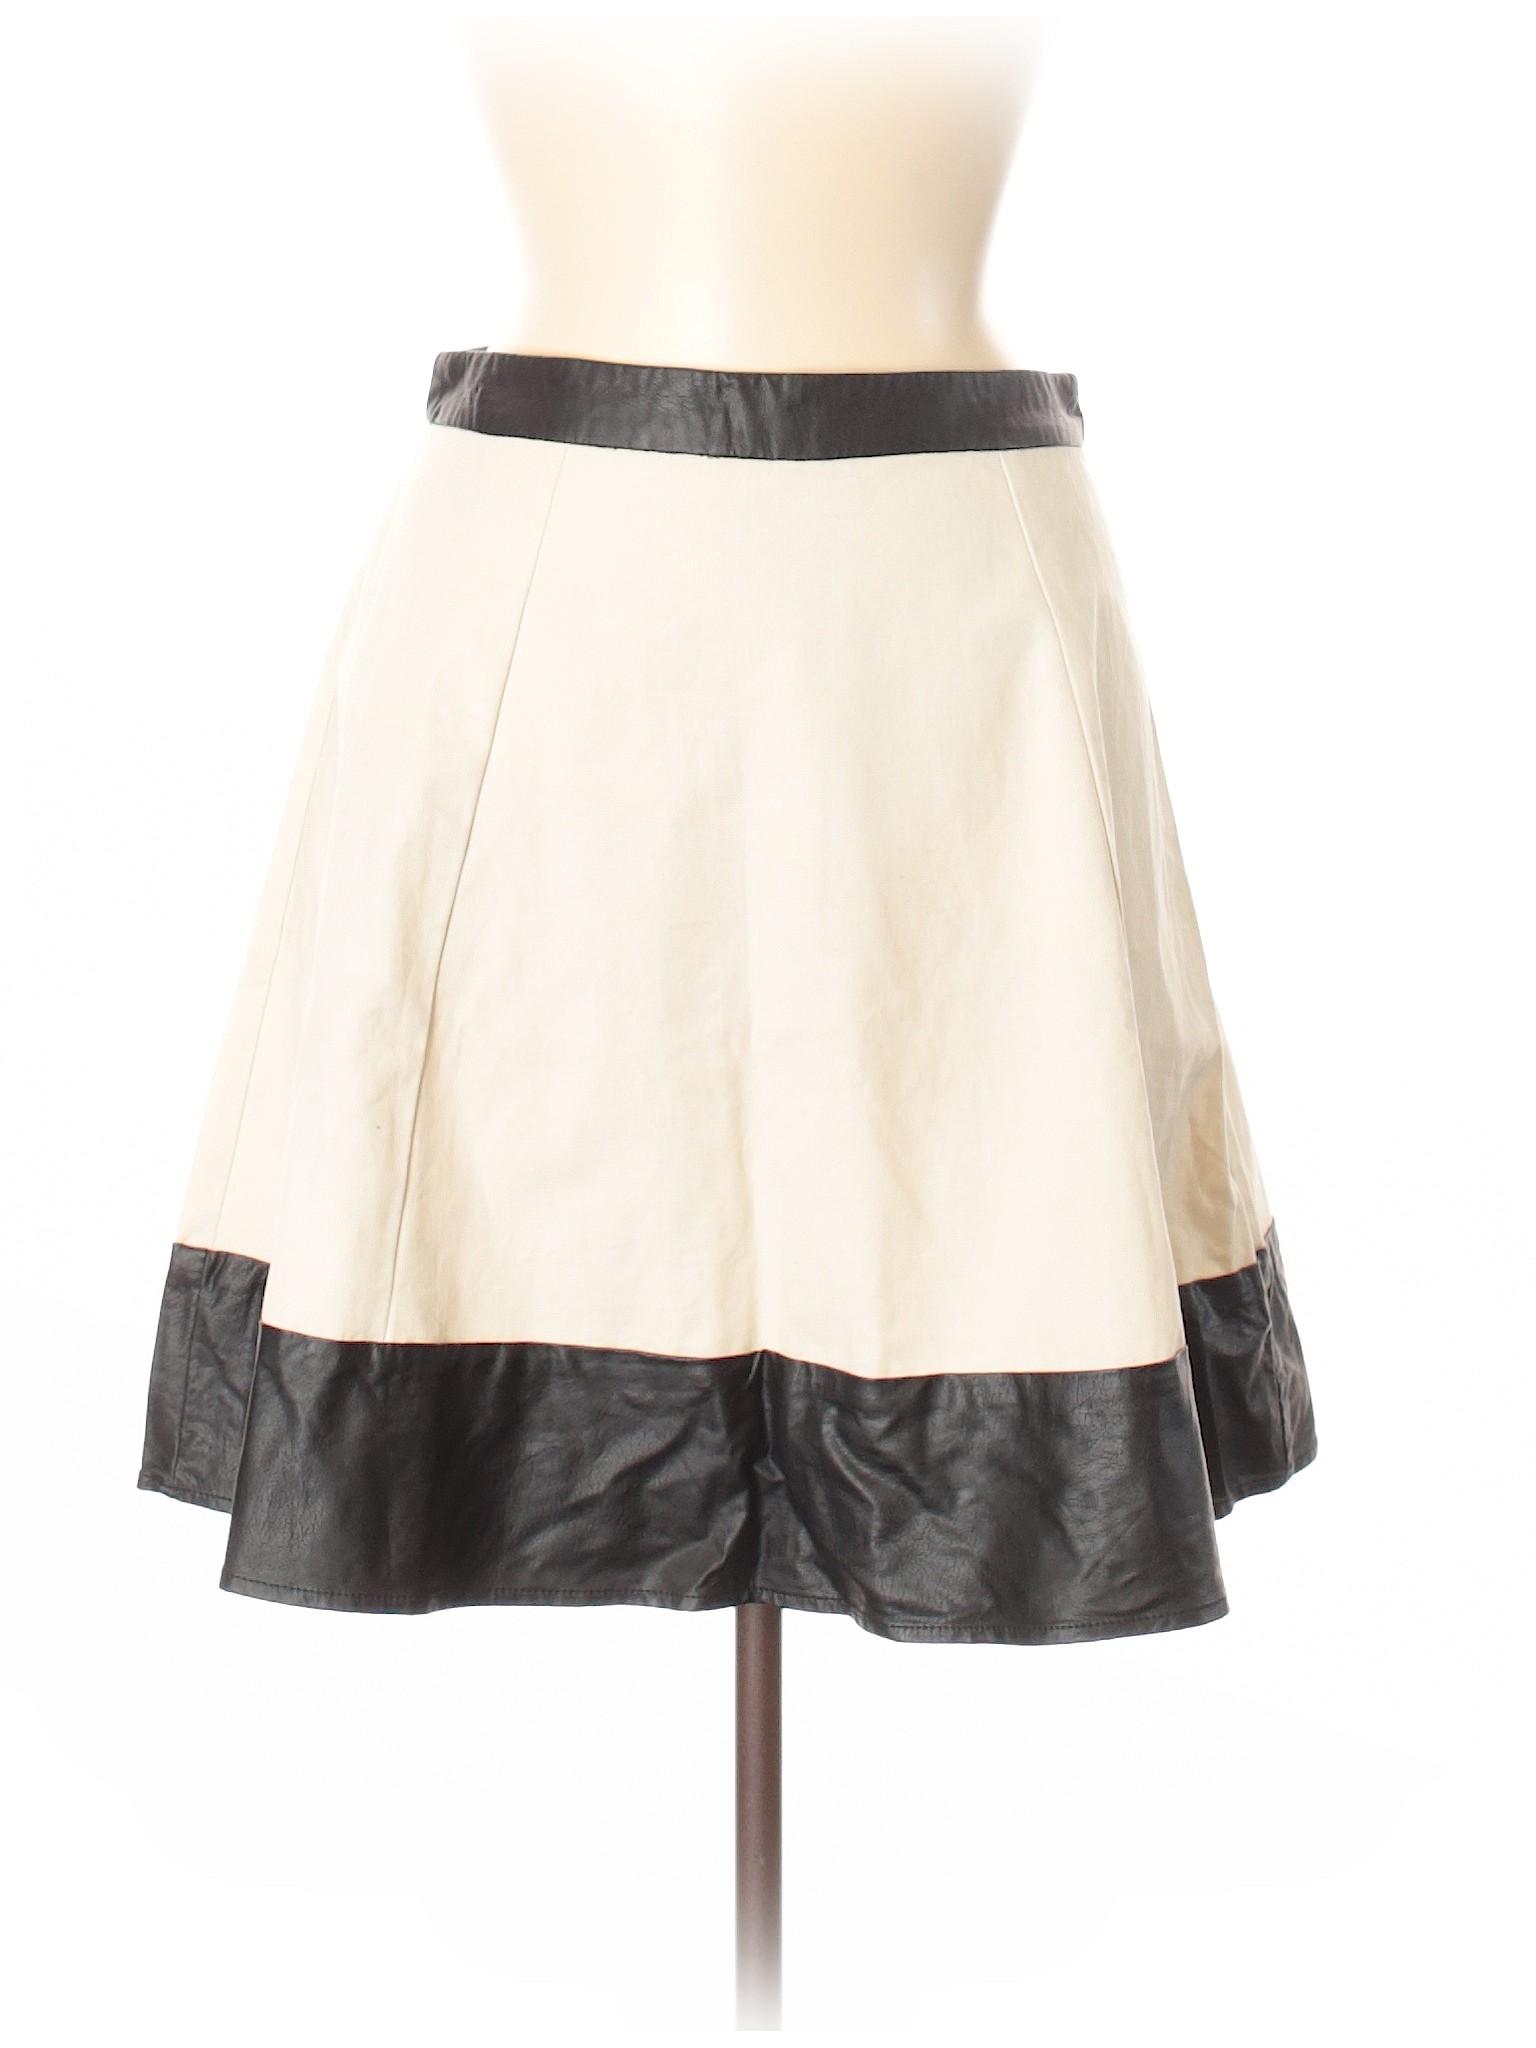 Skirt Casual Skirt Casual Boutique Boutique Casual Skirt Skirt Casual Boutique Boutique Skirt Skirt Boutique Casual Casual Boutique zBqwpzAr